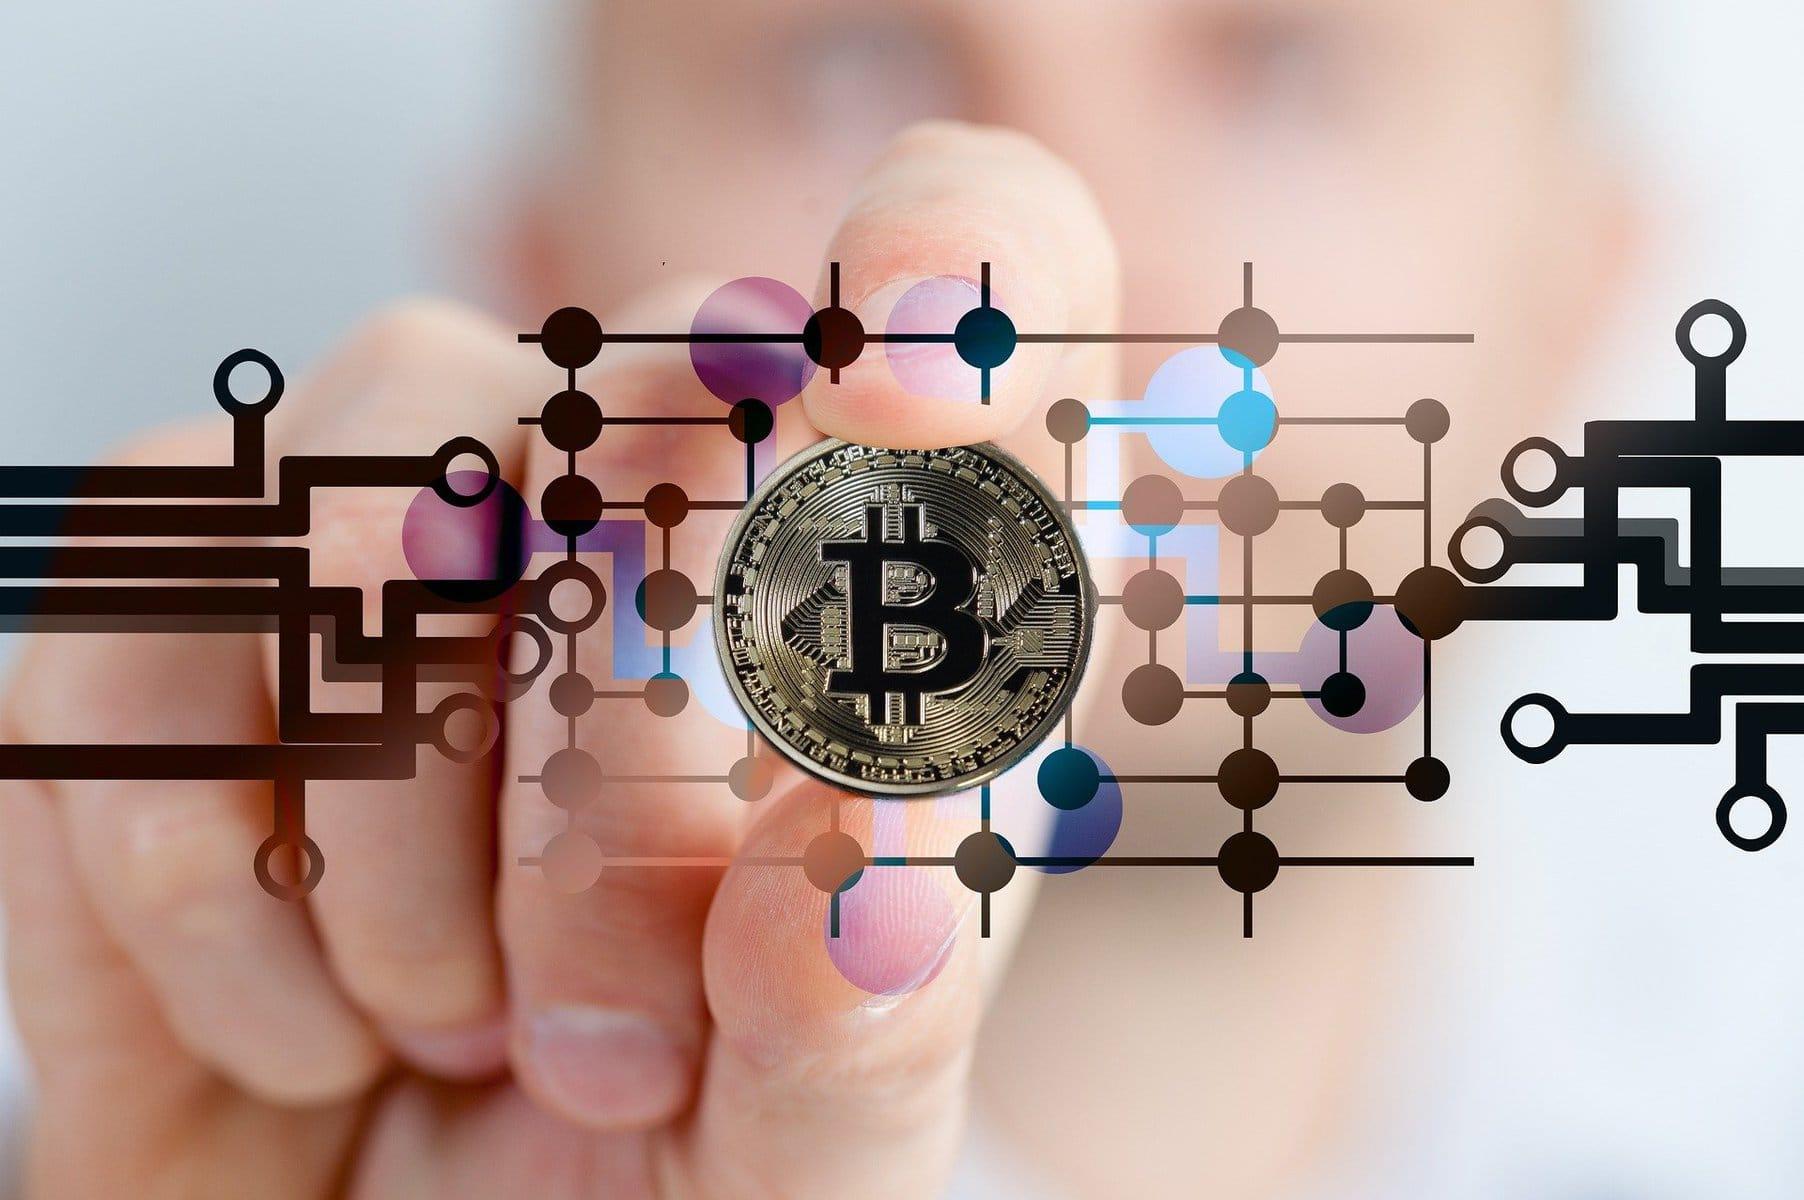 gruenderkueche-2019-bitcoin-cryptocurrency-ico-events-veranstaltungen